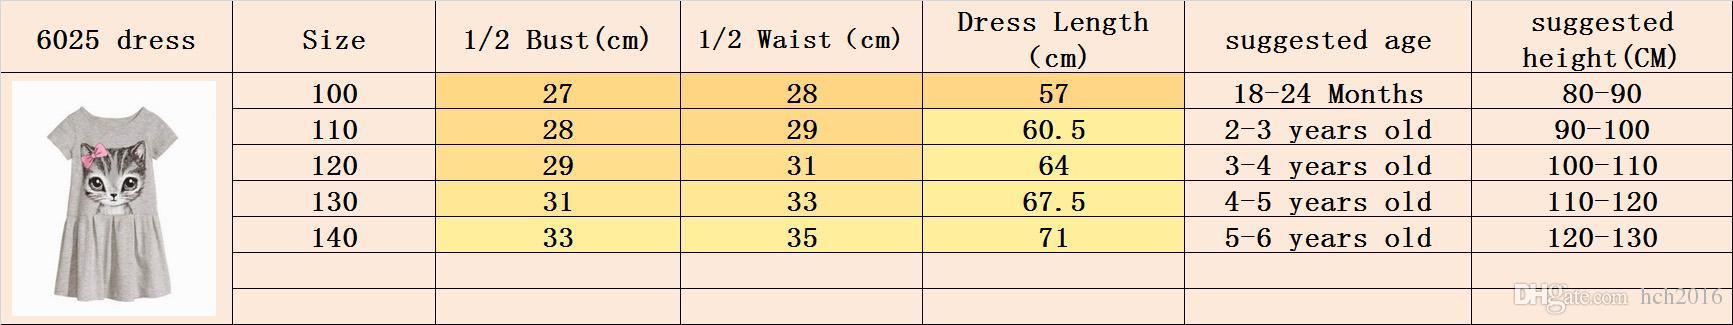 Baby & Kids Clothing Girls' Dresses Summer Korean Preppy Style Cotton Boat Neck Short sleeve Animal cat Printed Knee-Length A-Line Dress